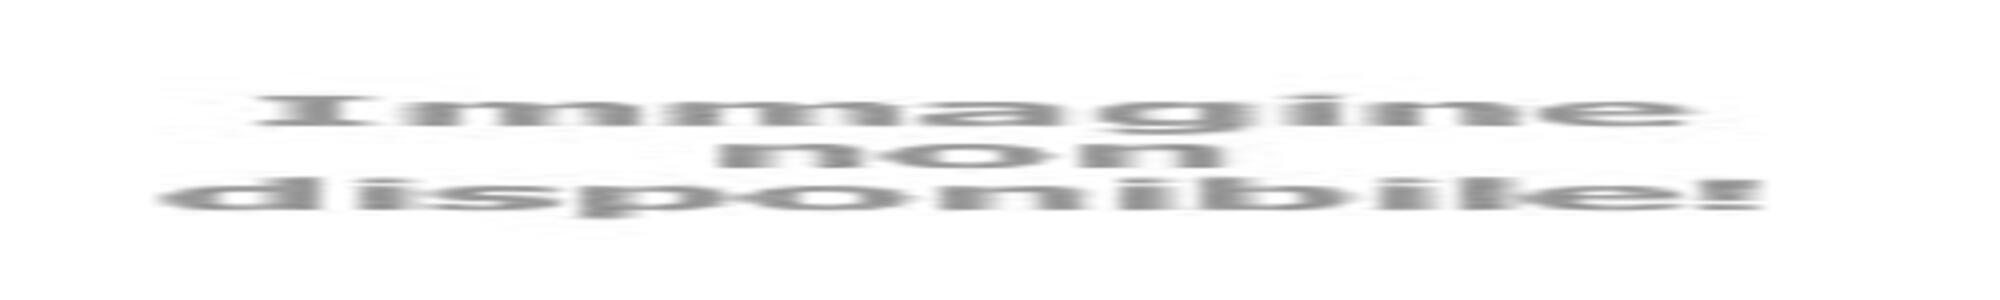 OFFERTA VOLLEYBALL NATIONS LEAGUE 2021